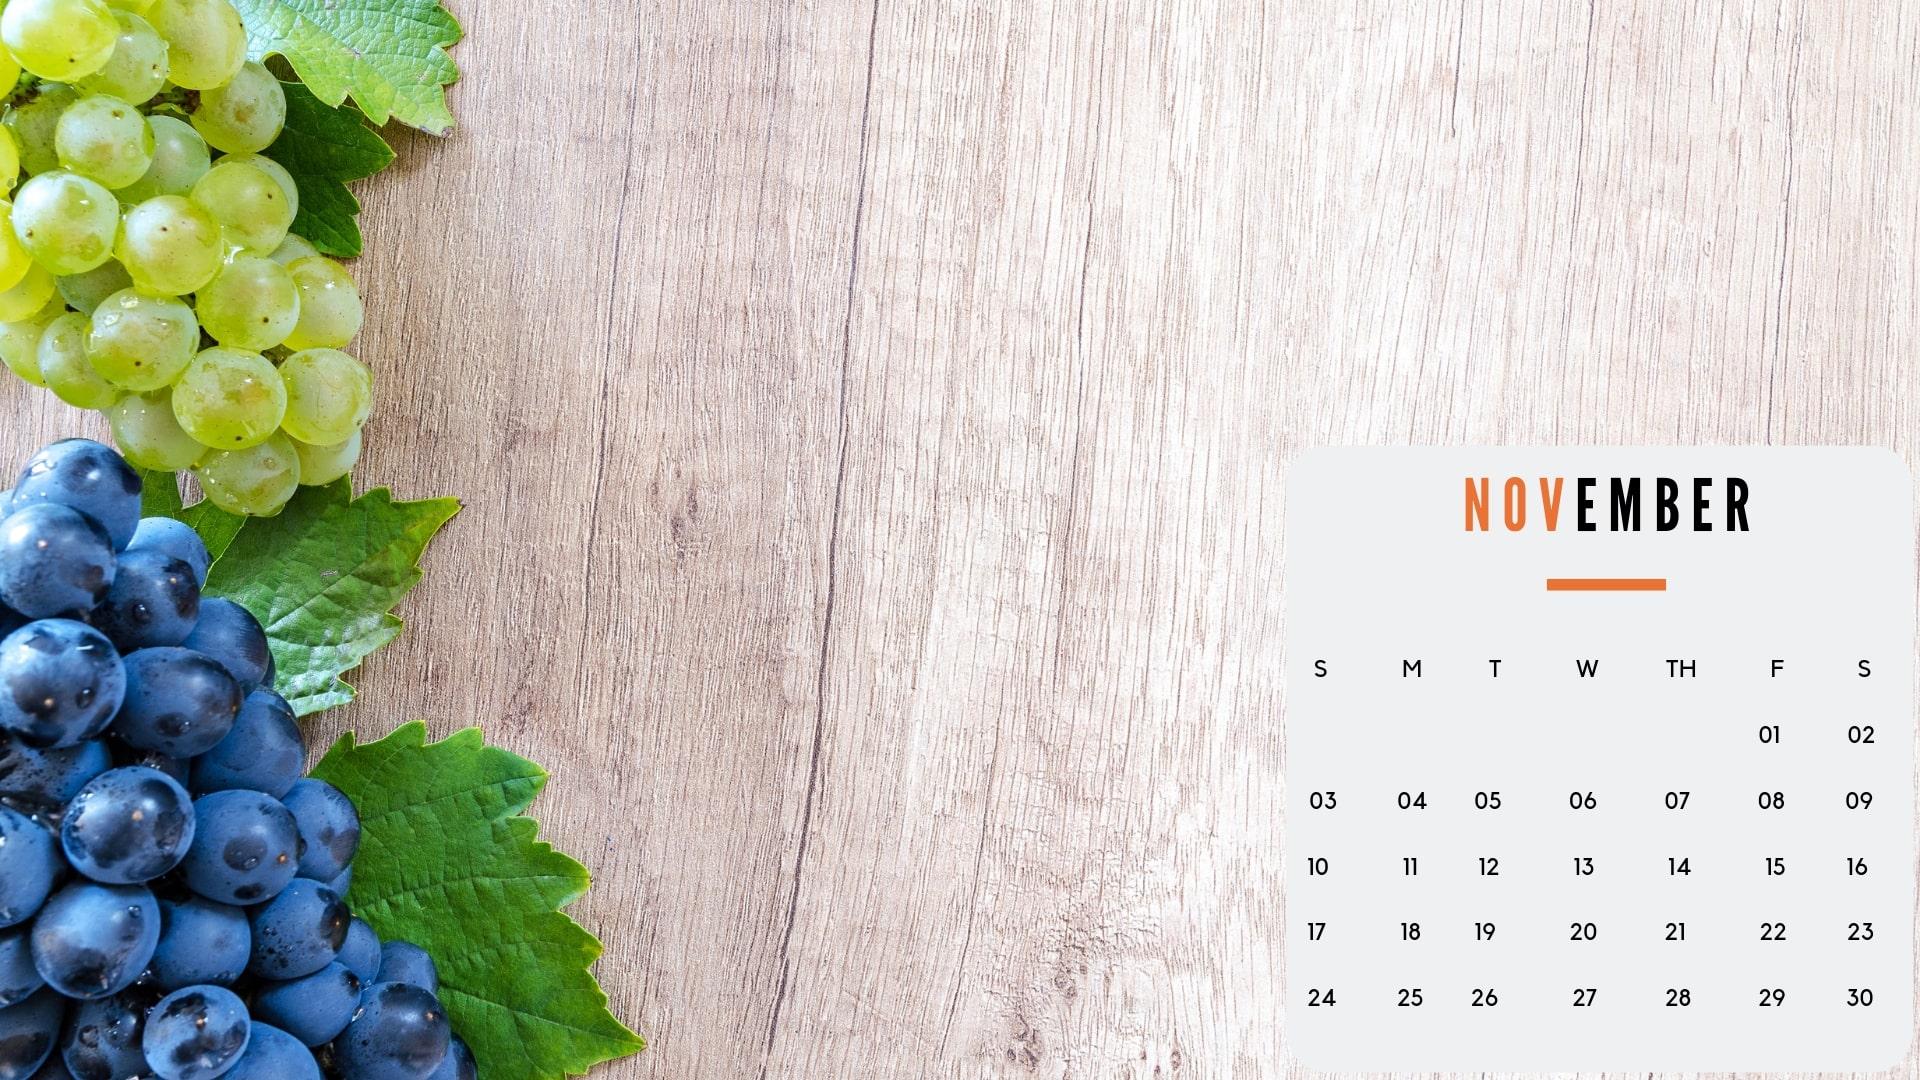 november wallpaper calendar